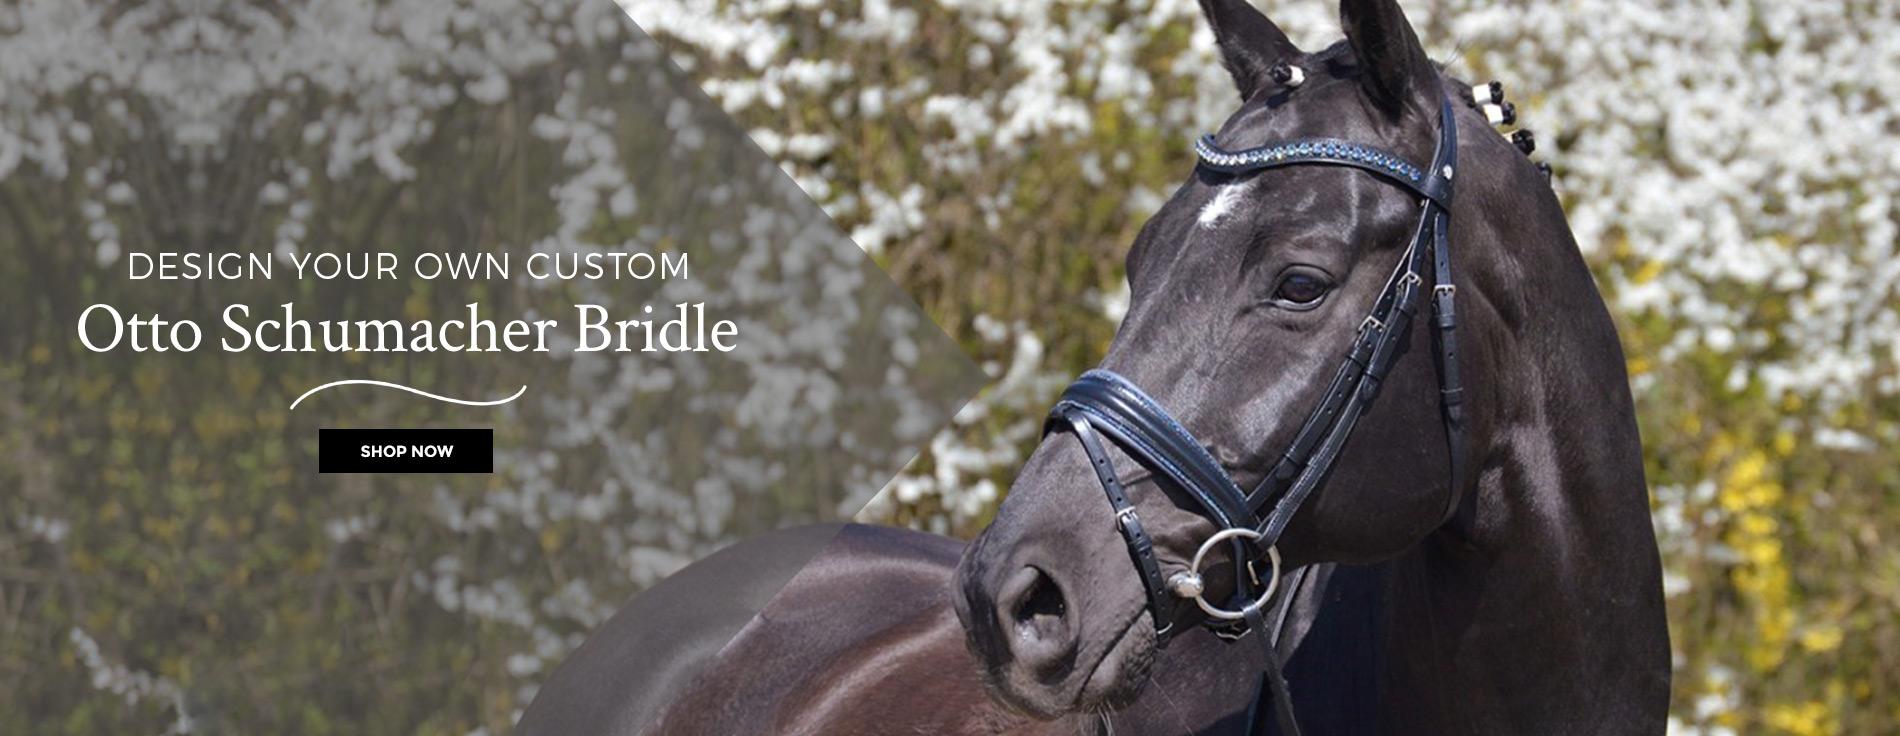 Equestrian Apparel, Customizable Tack, & Fashionable Accessories